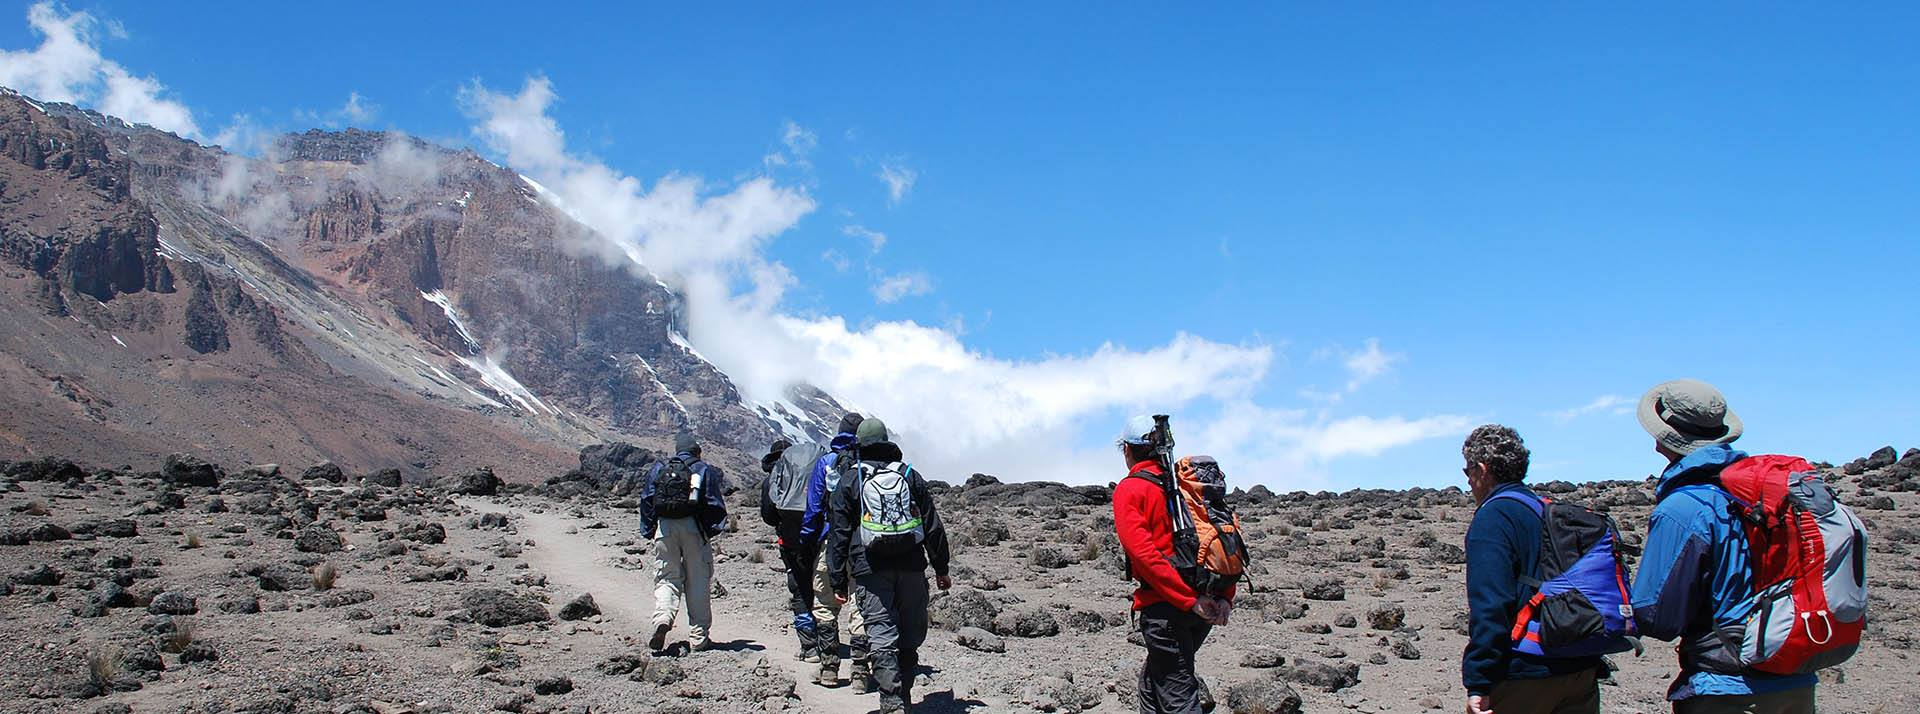 2-days-kilimanjaro.jpg